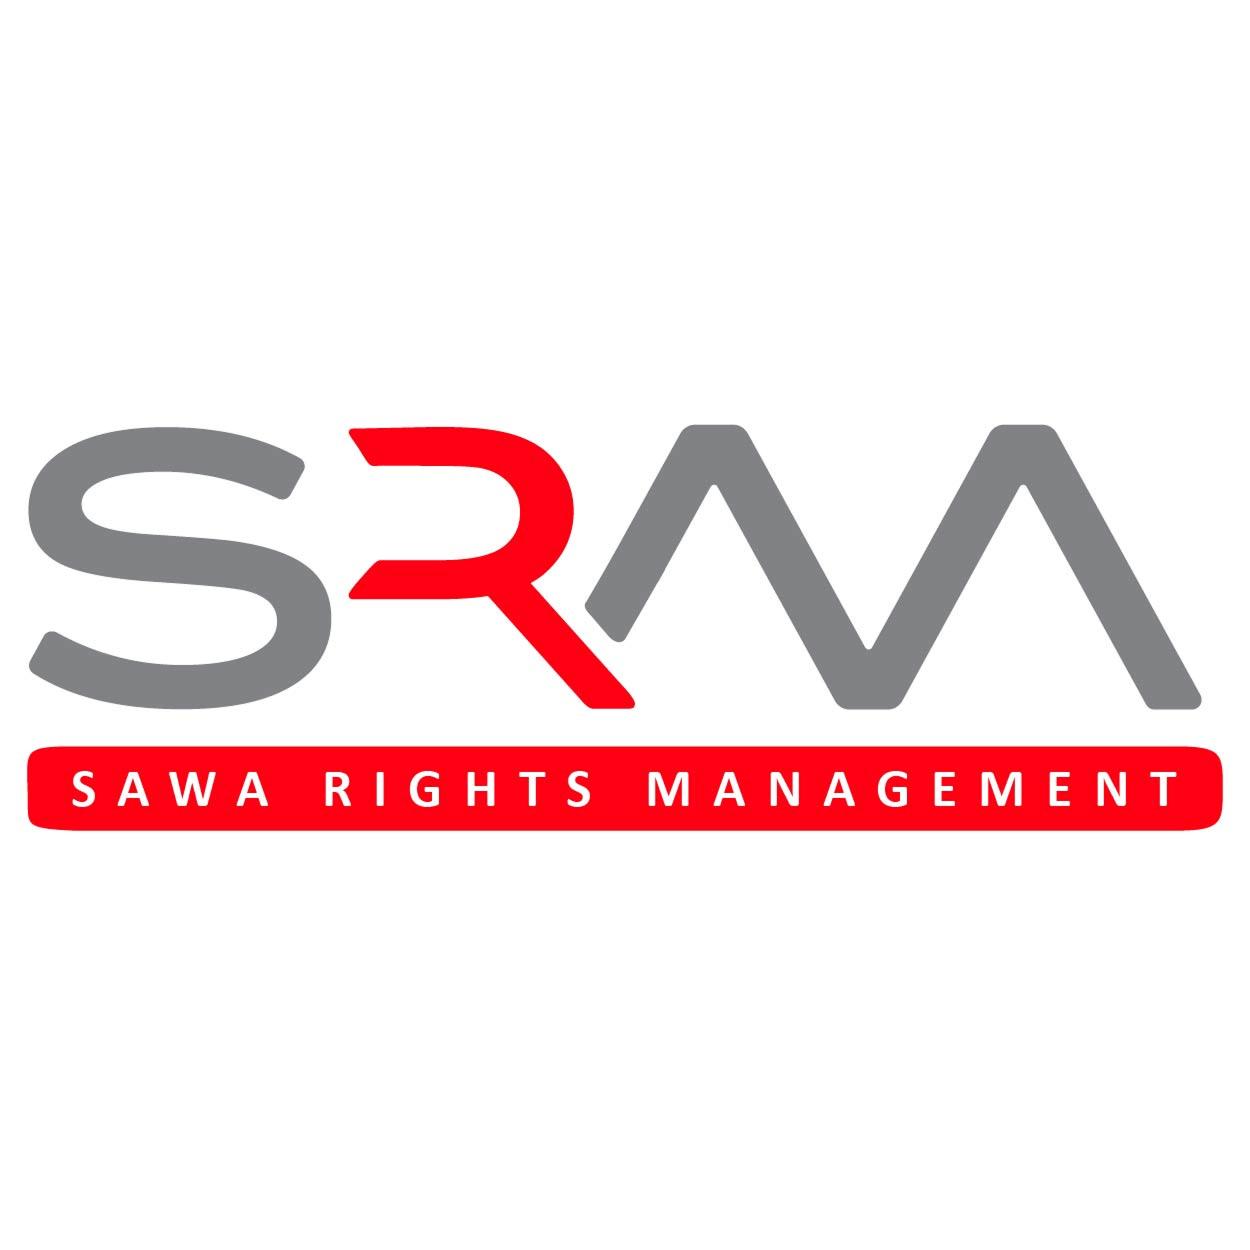 SAWA Rights Management